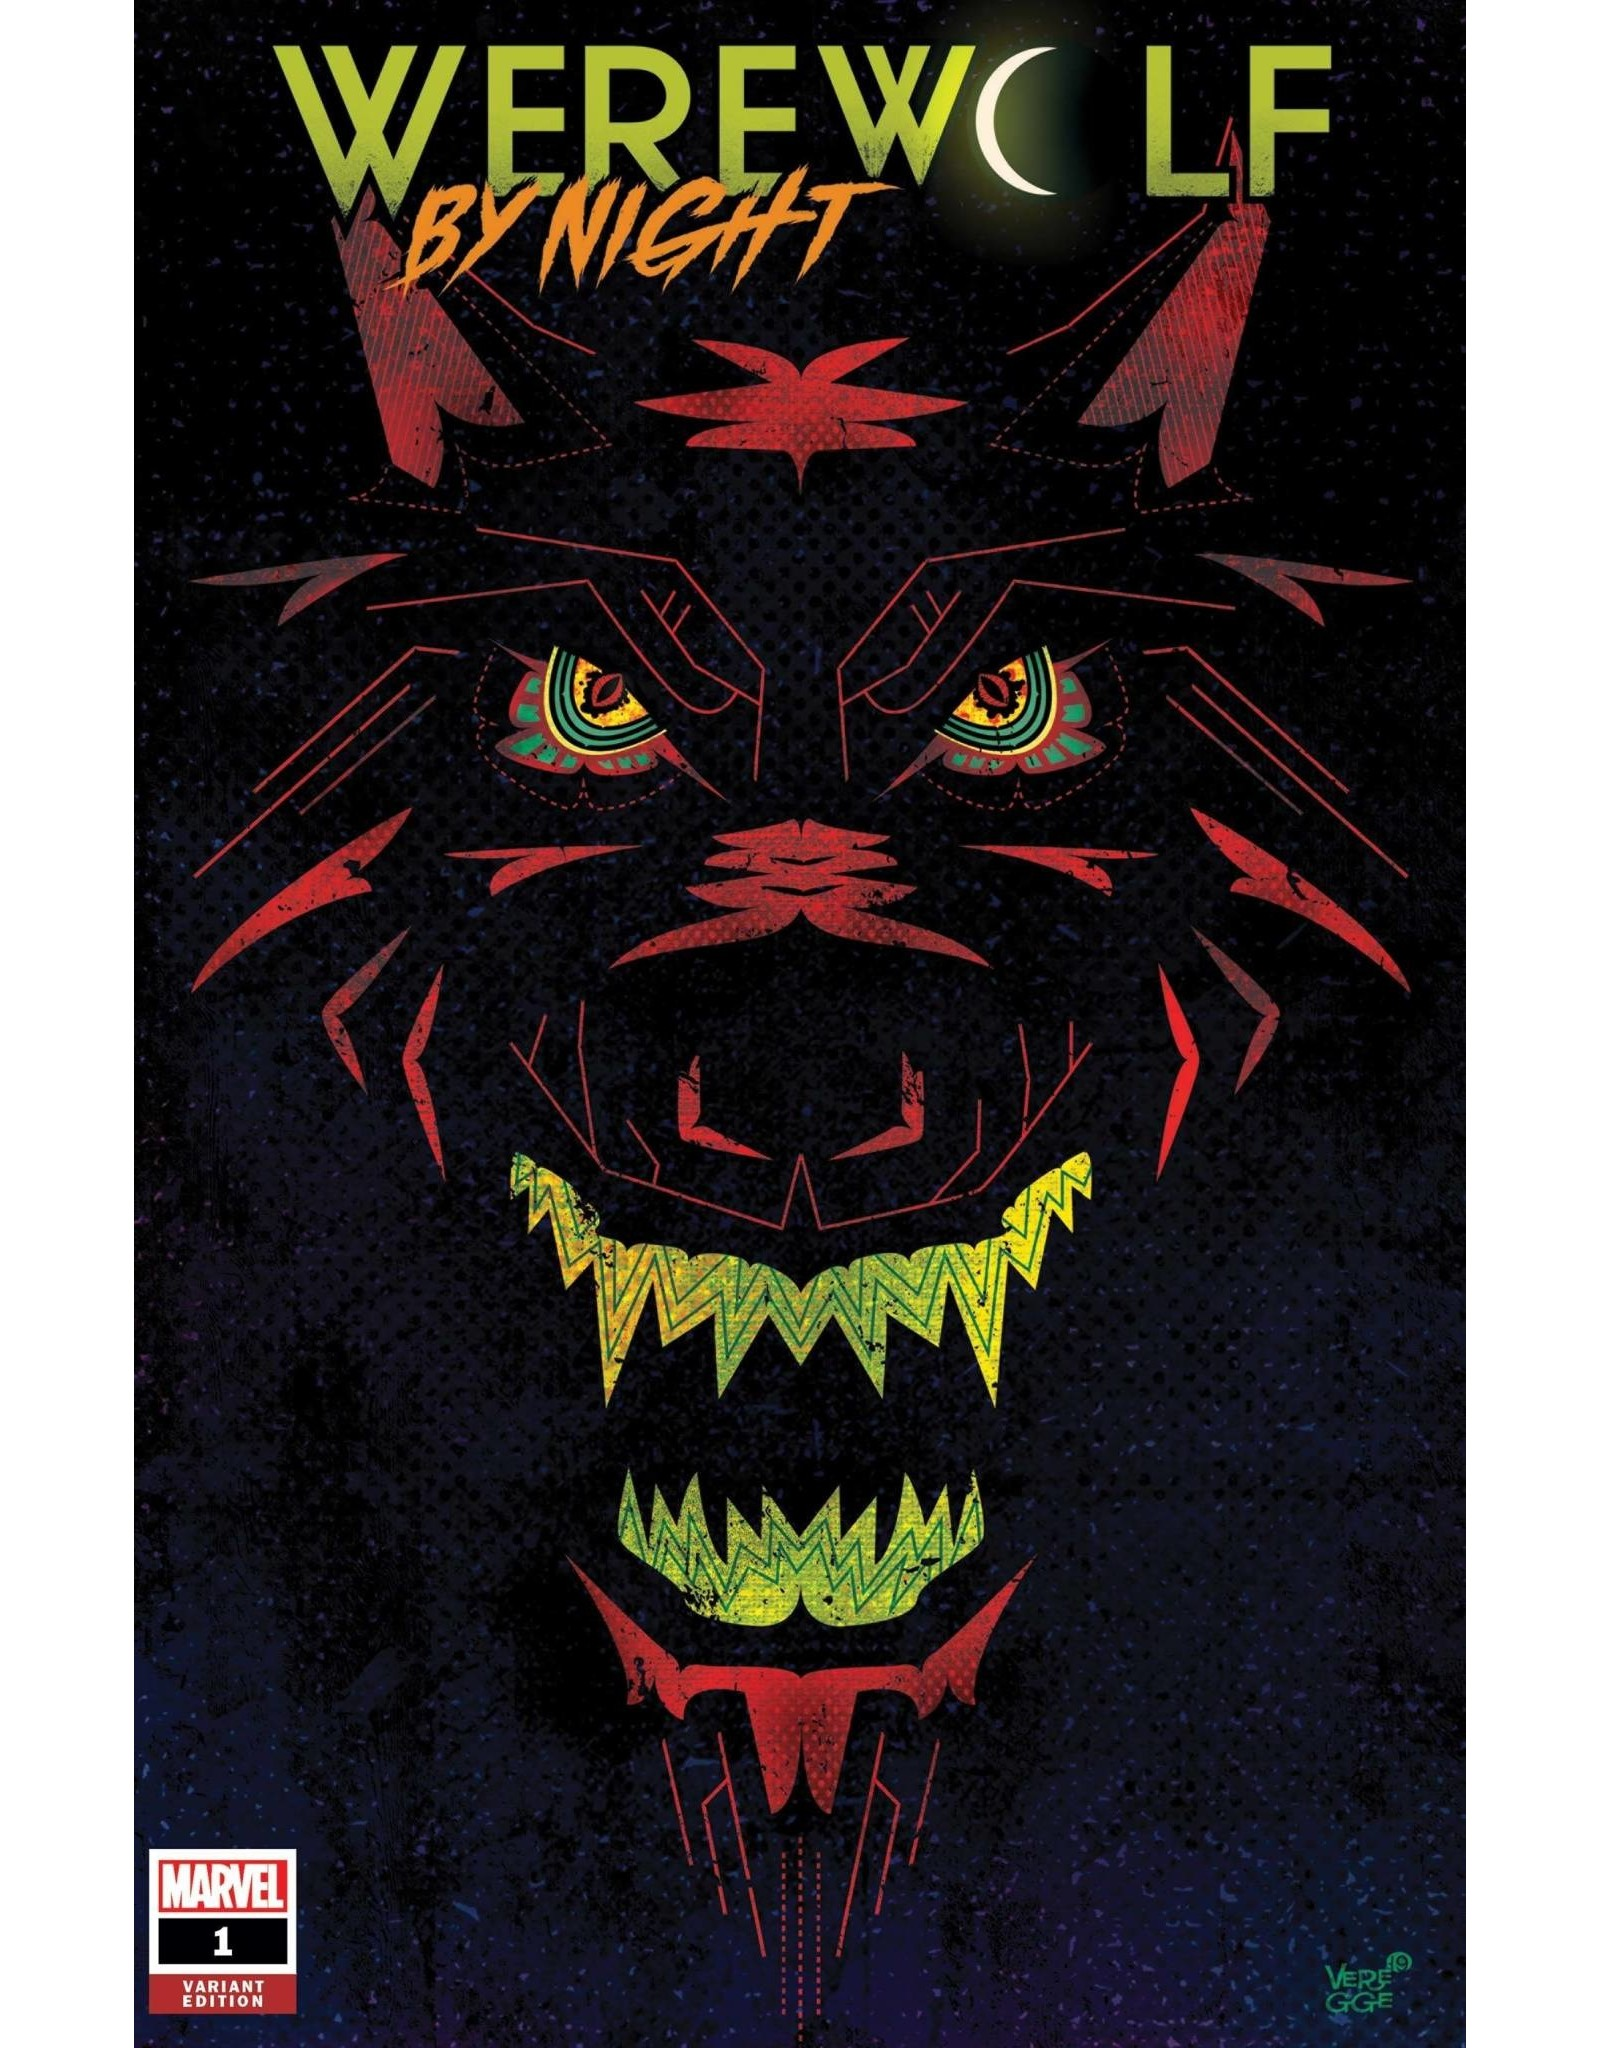 Marvel Comics WEREWOLF BY NIGHT #1 (OF 4) VEREGGE VAR